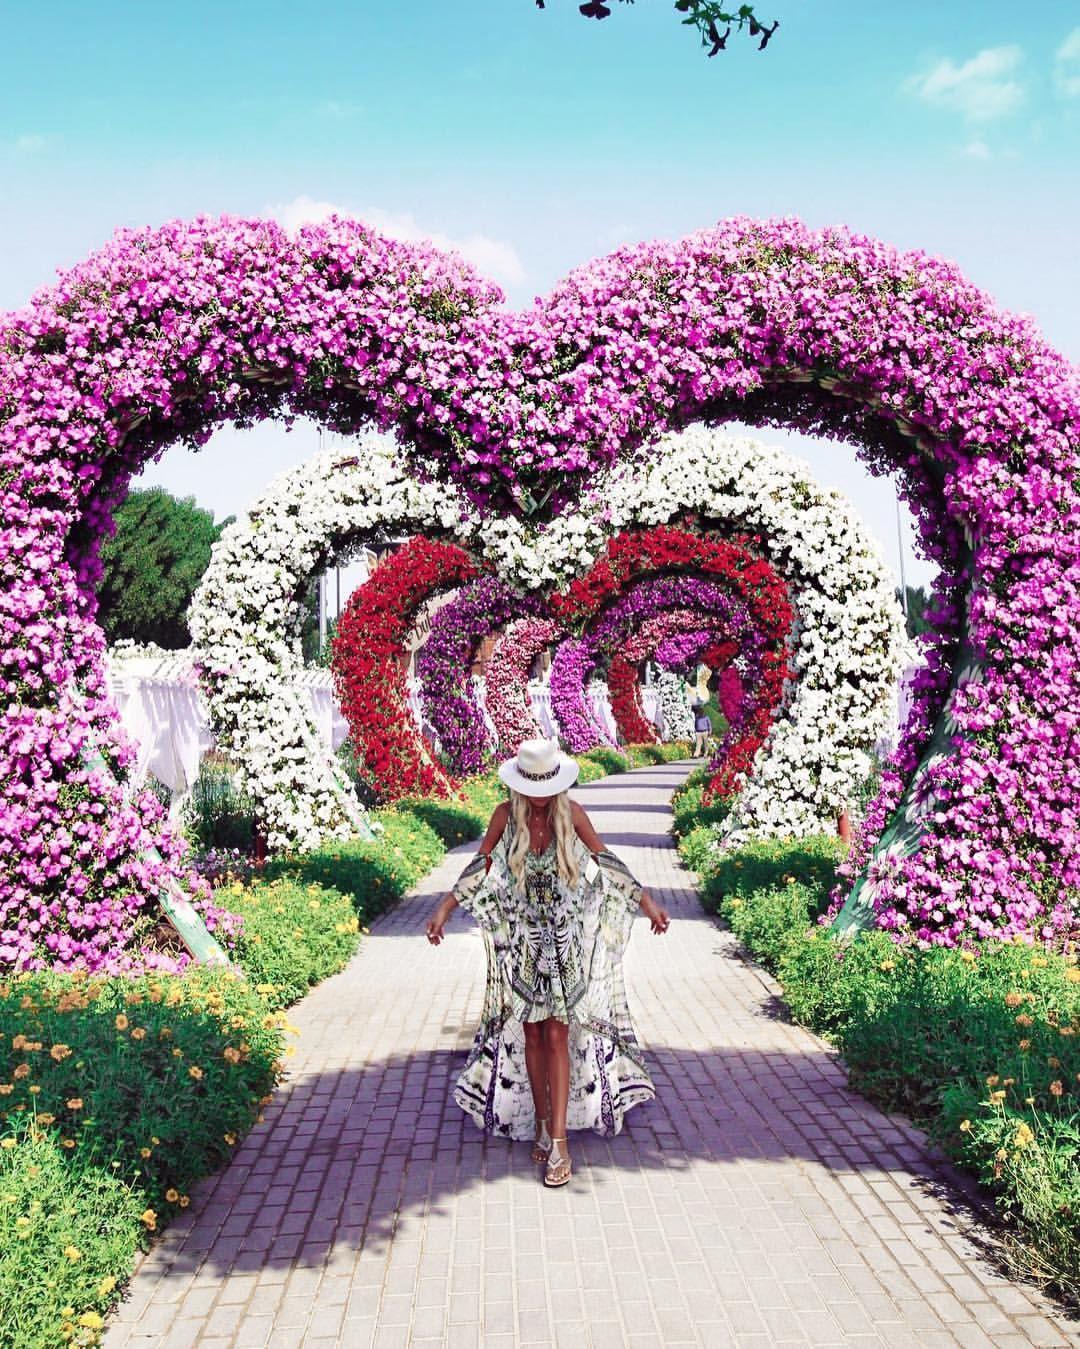 Pre Wedding Outdoor Ideas: Pin By Gabriela Gaspar On Travel Inspiration In 2019